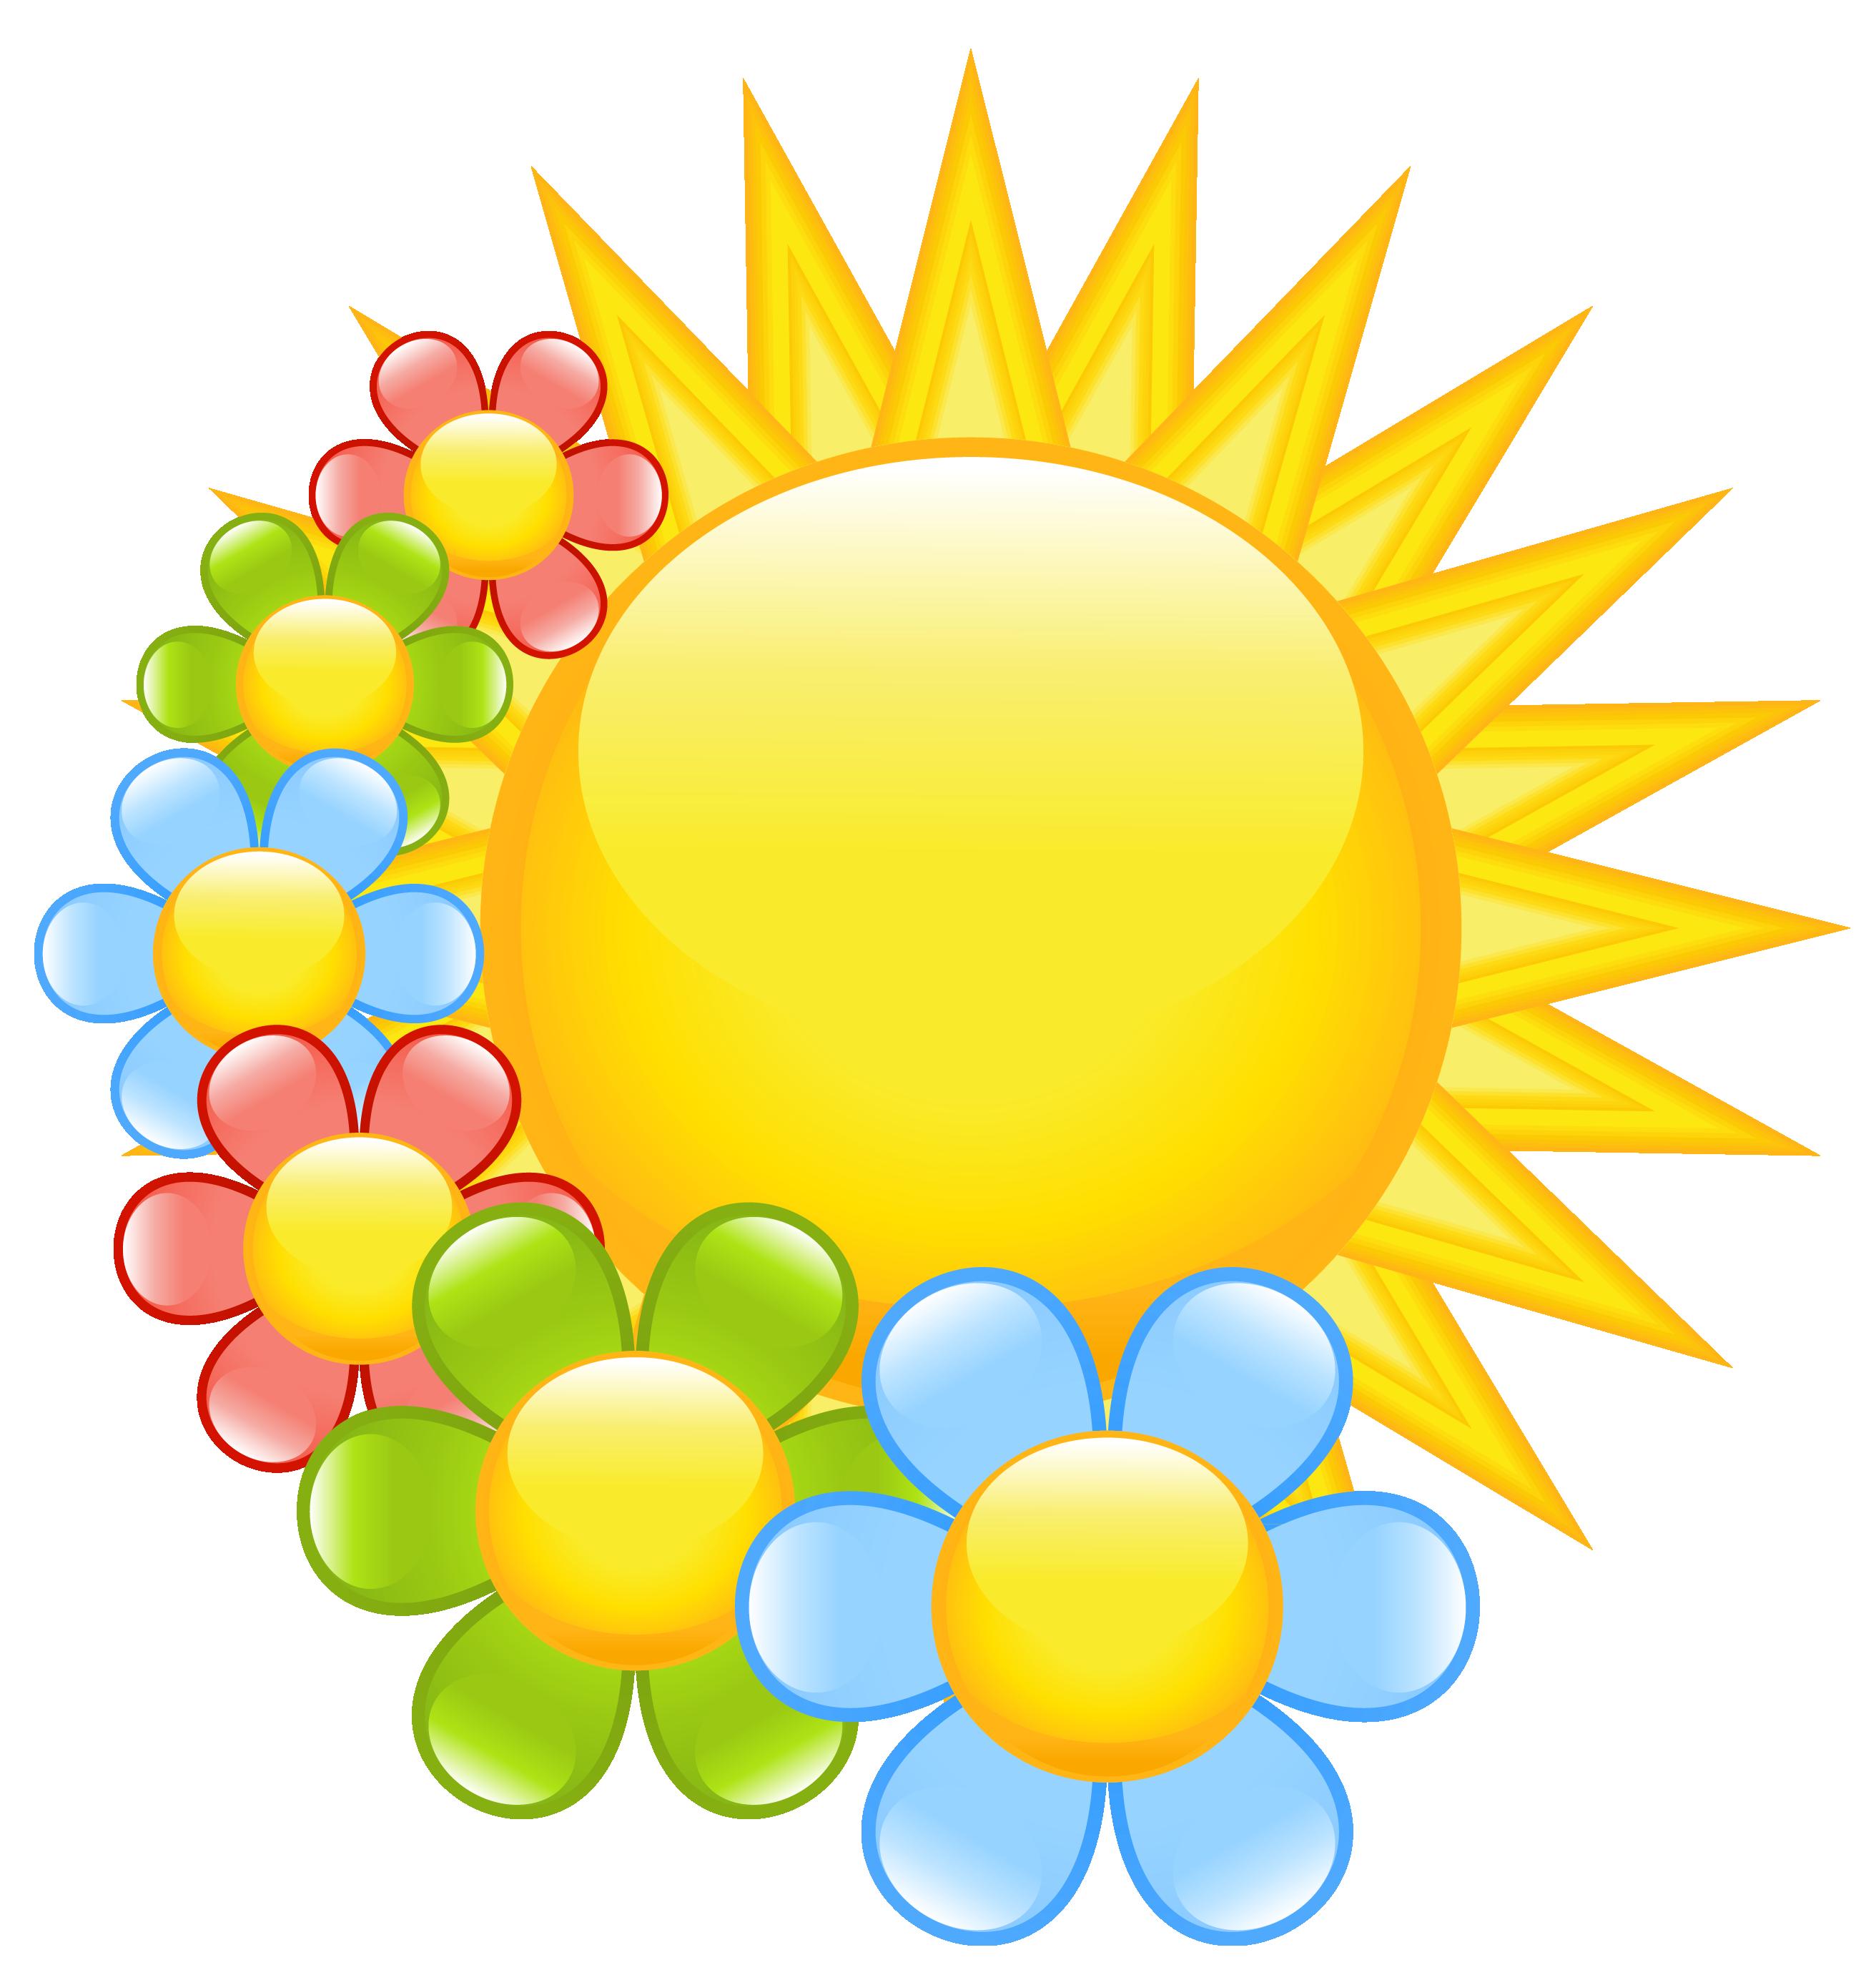 free-spring-flower-clip-art-cliparts-co-gZ5JMI-clipart.png